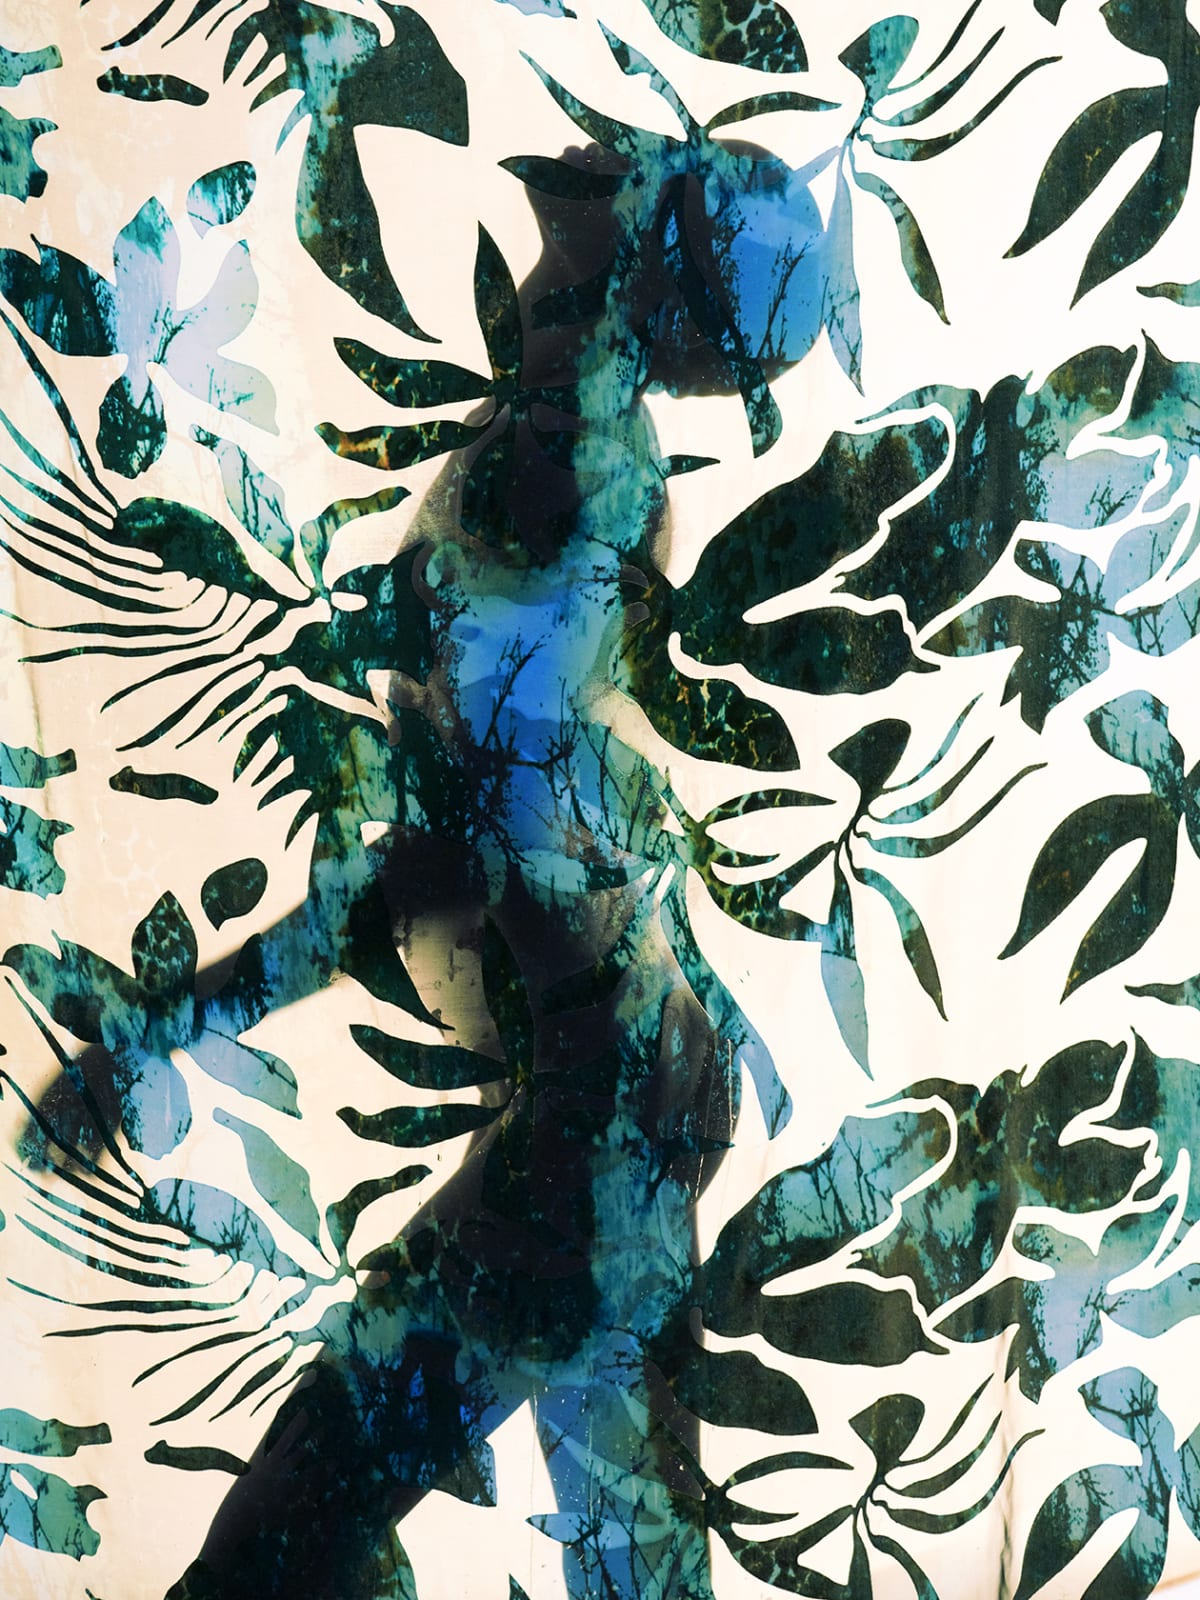 Carli Hermès, Distortion - Canopy